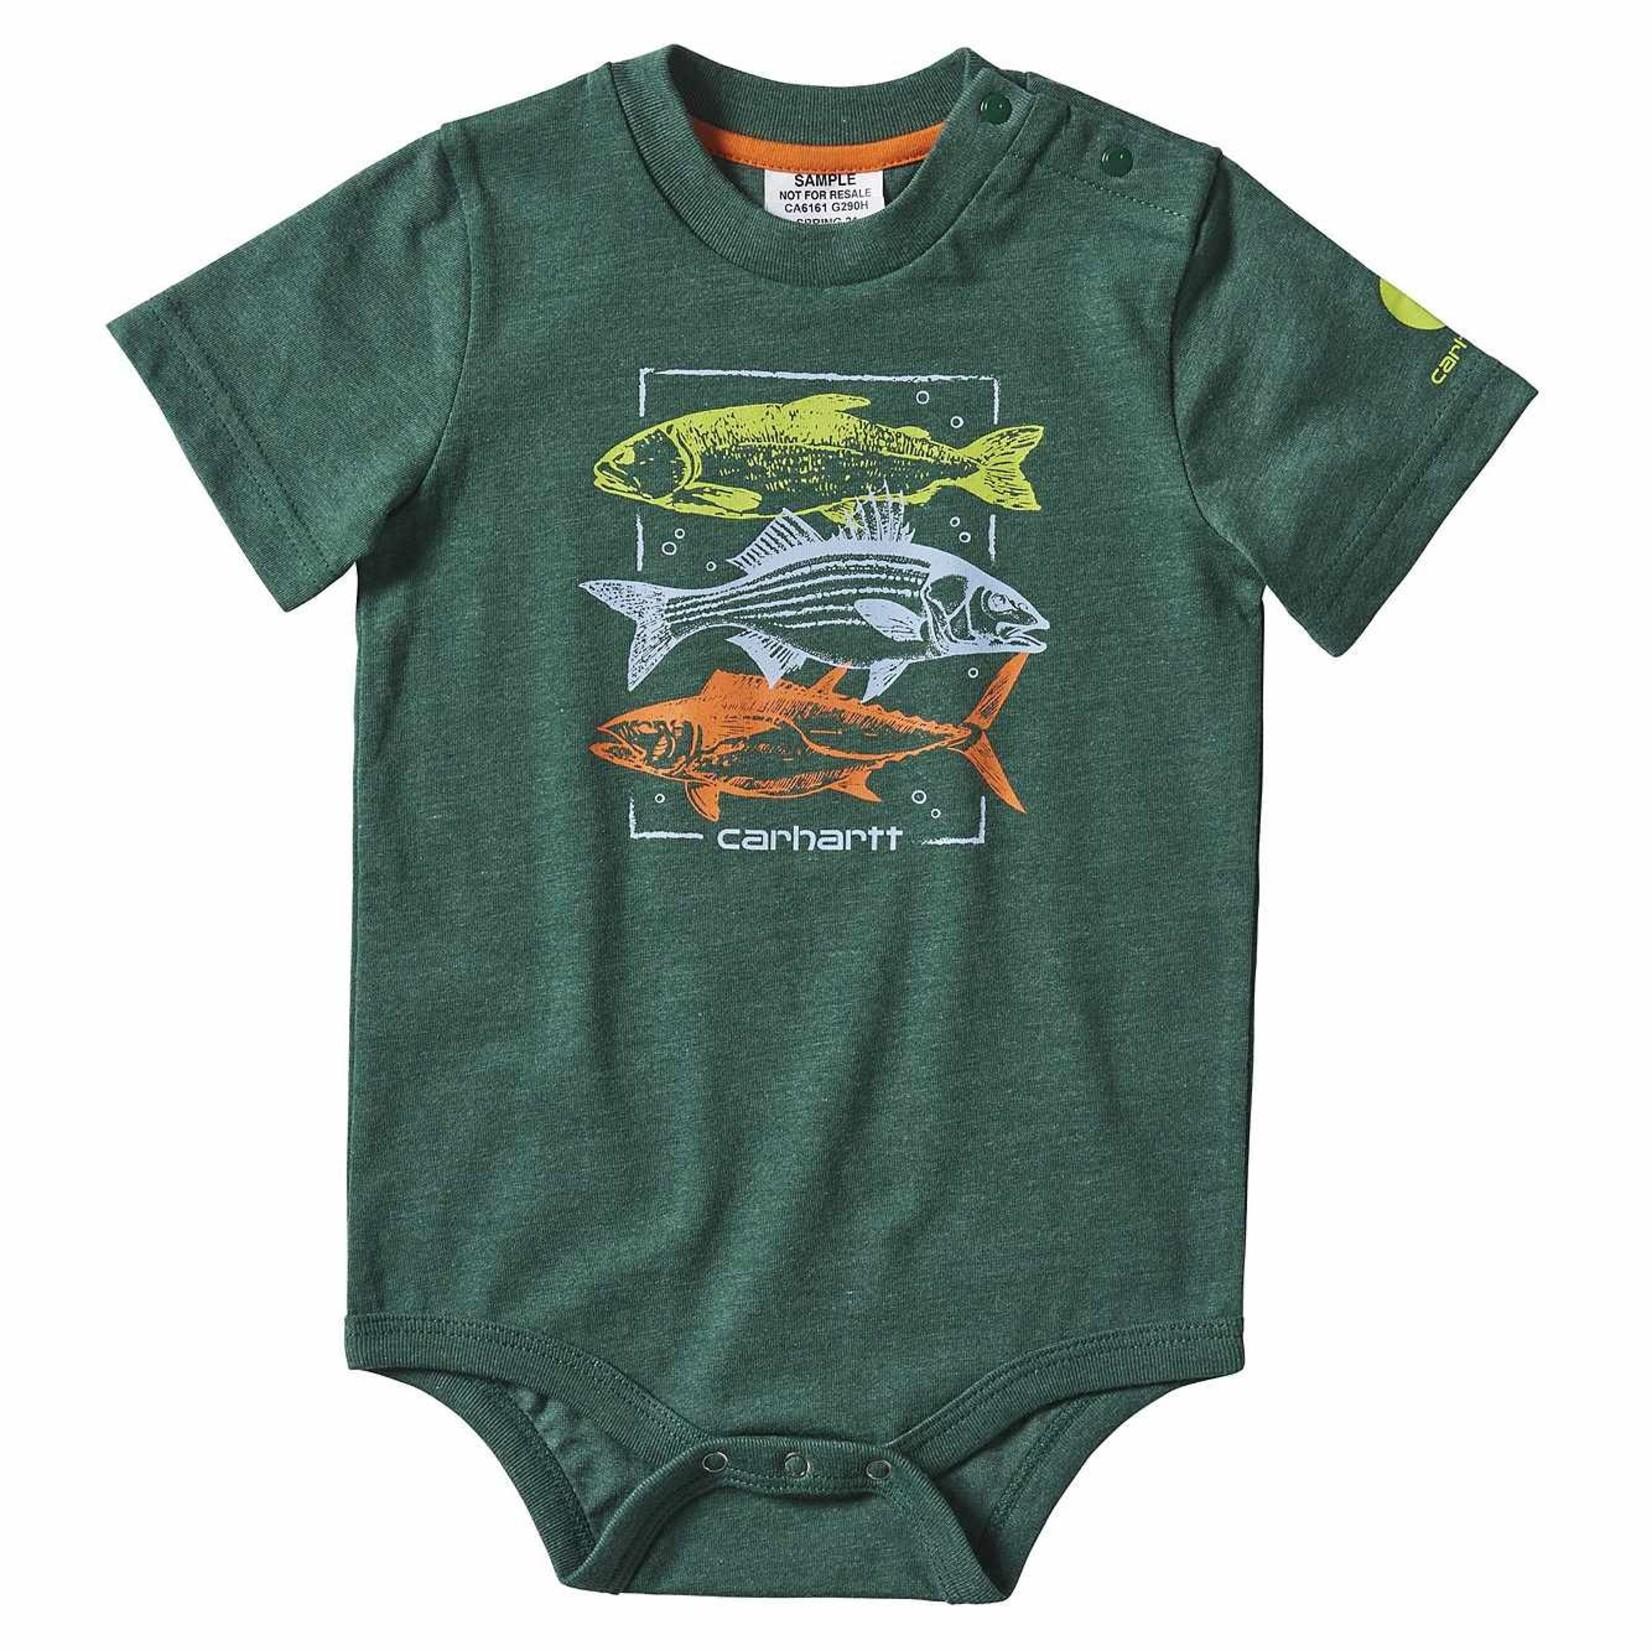 Carhartt Carhartt Kids CA6161 Fish Body Shirt